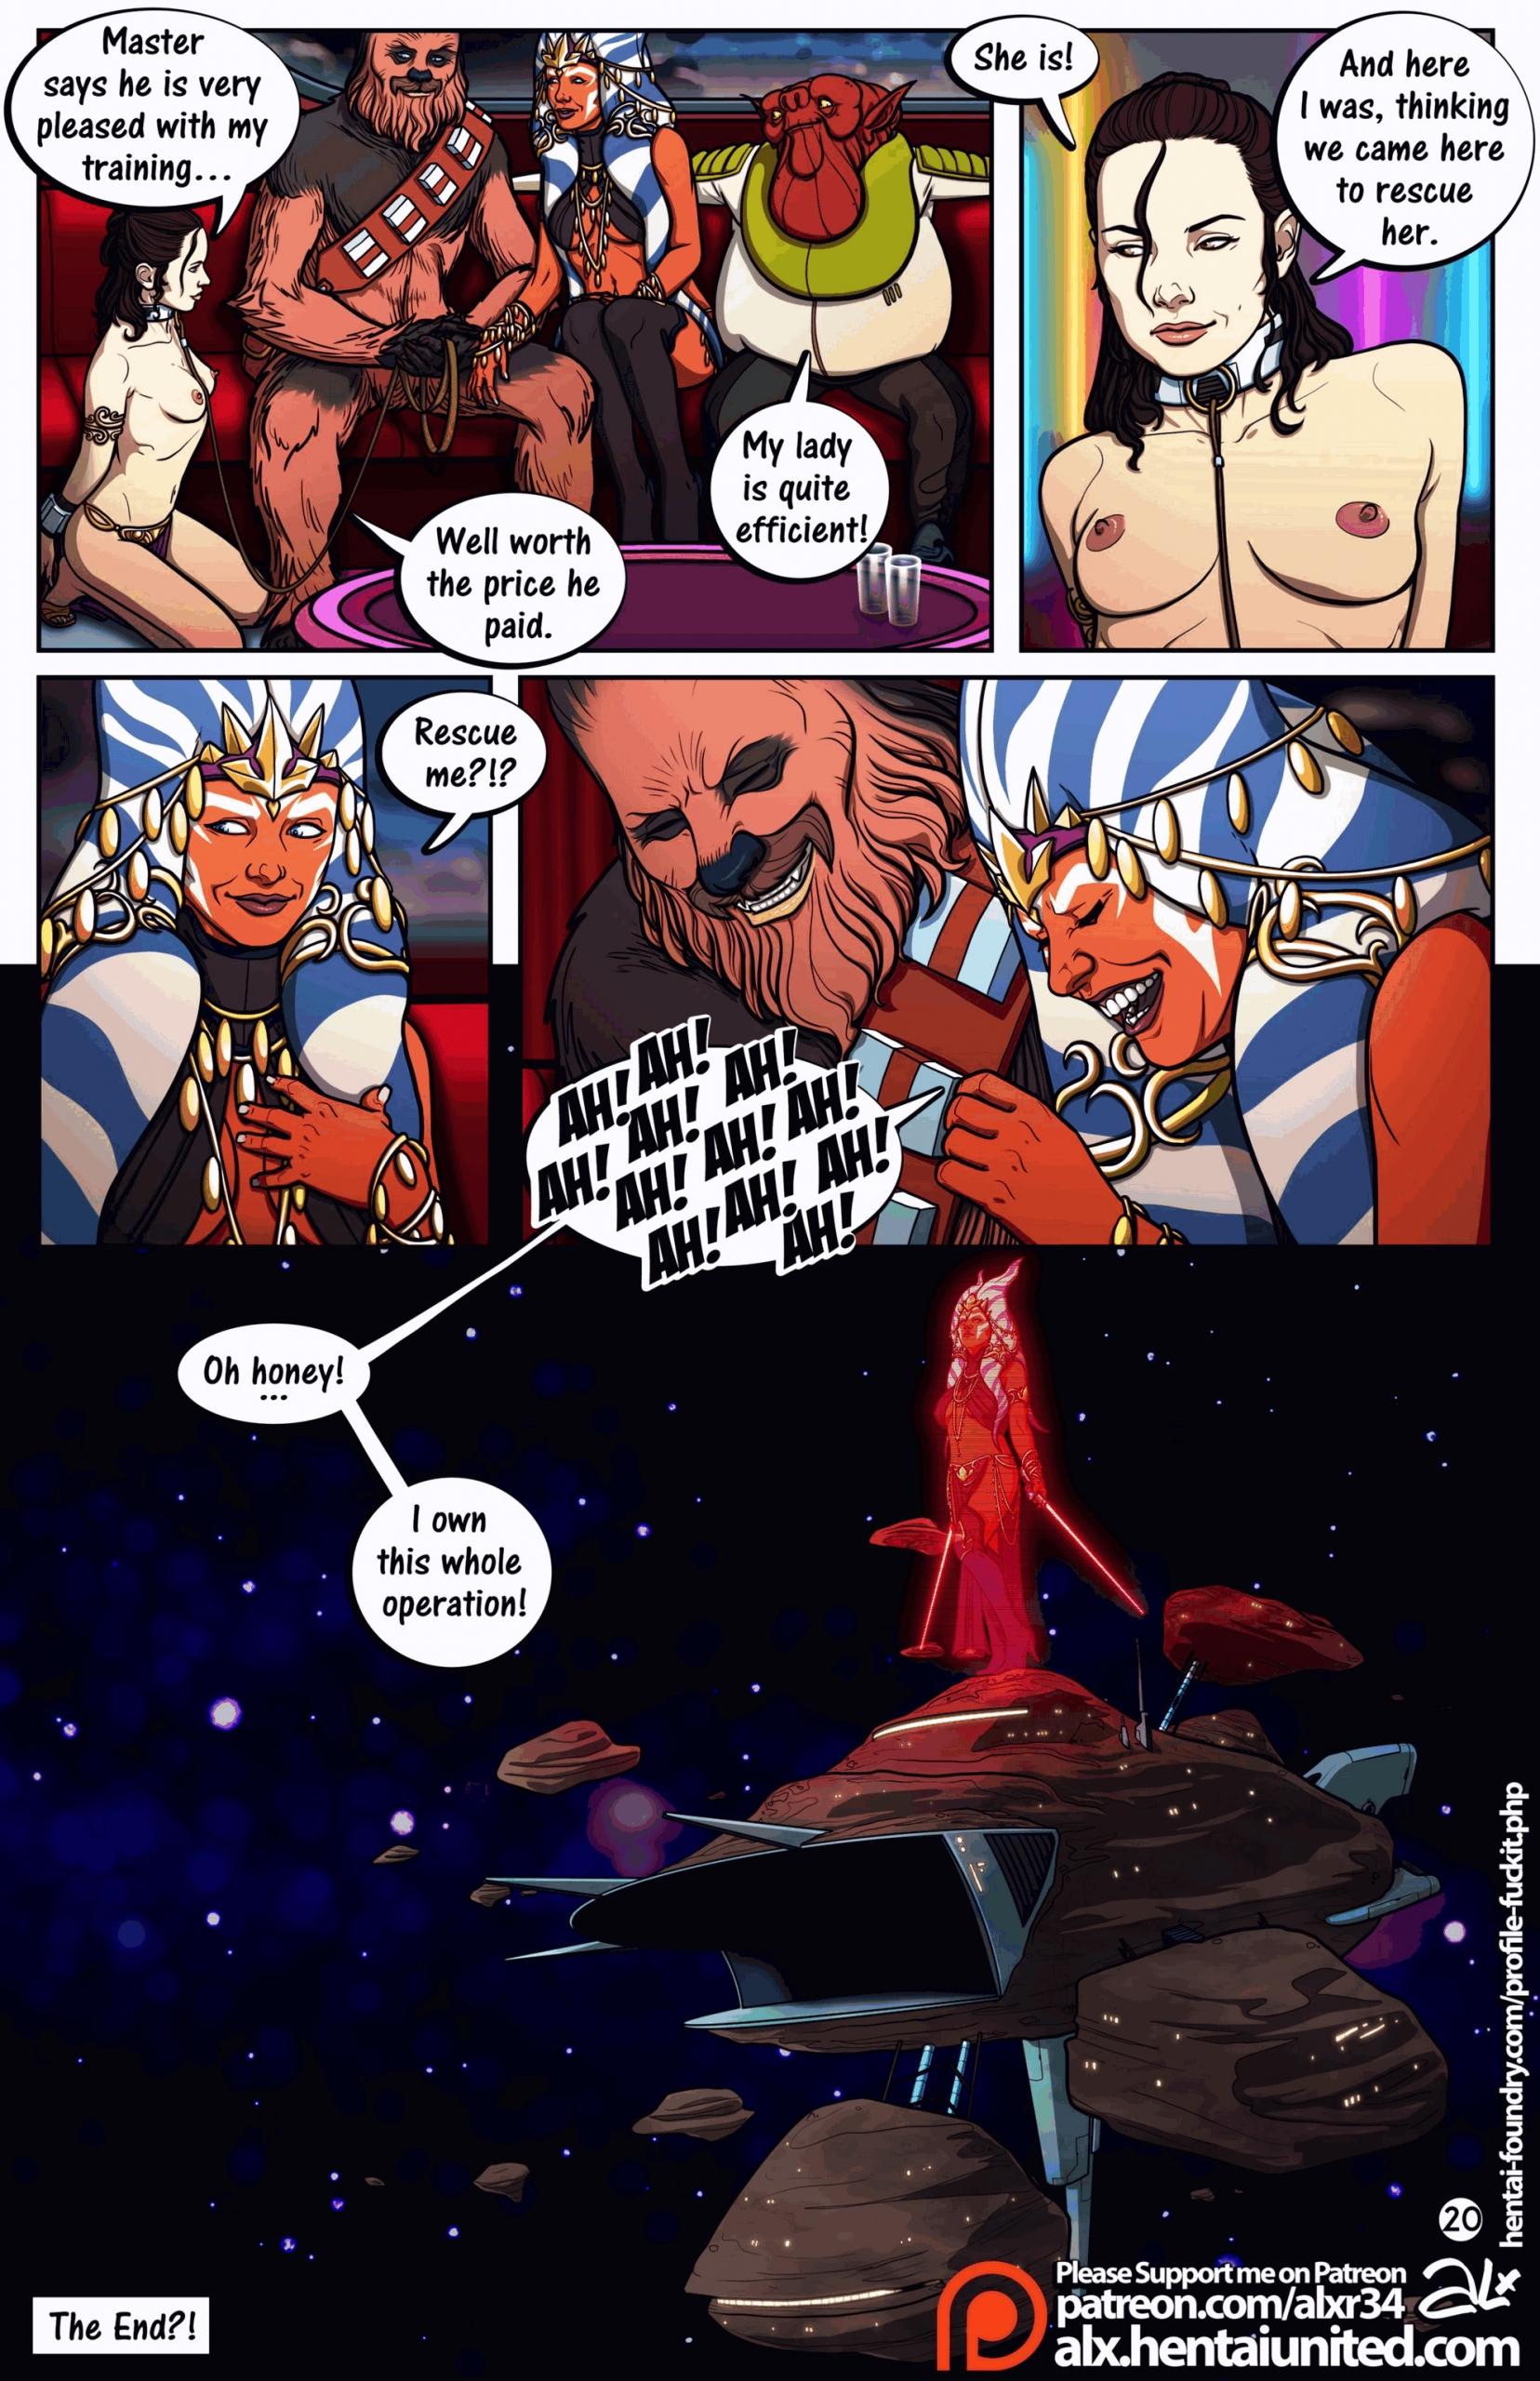 star wars porn comic page 21